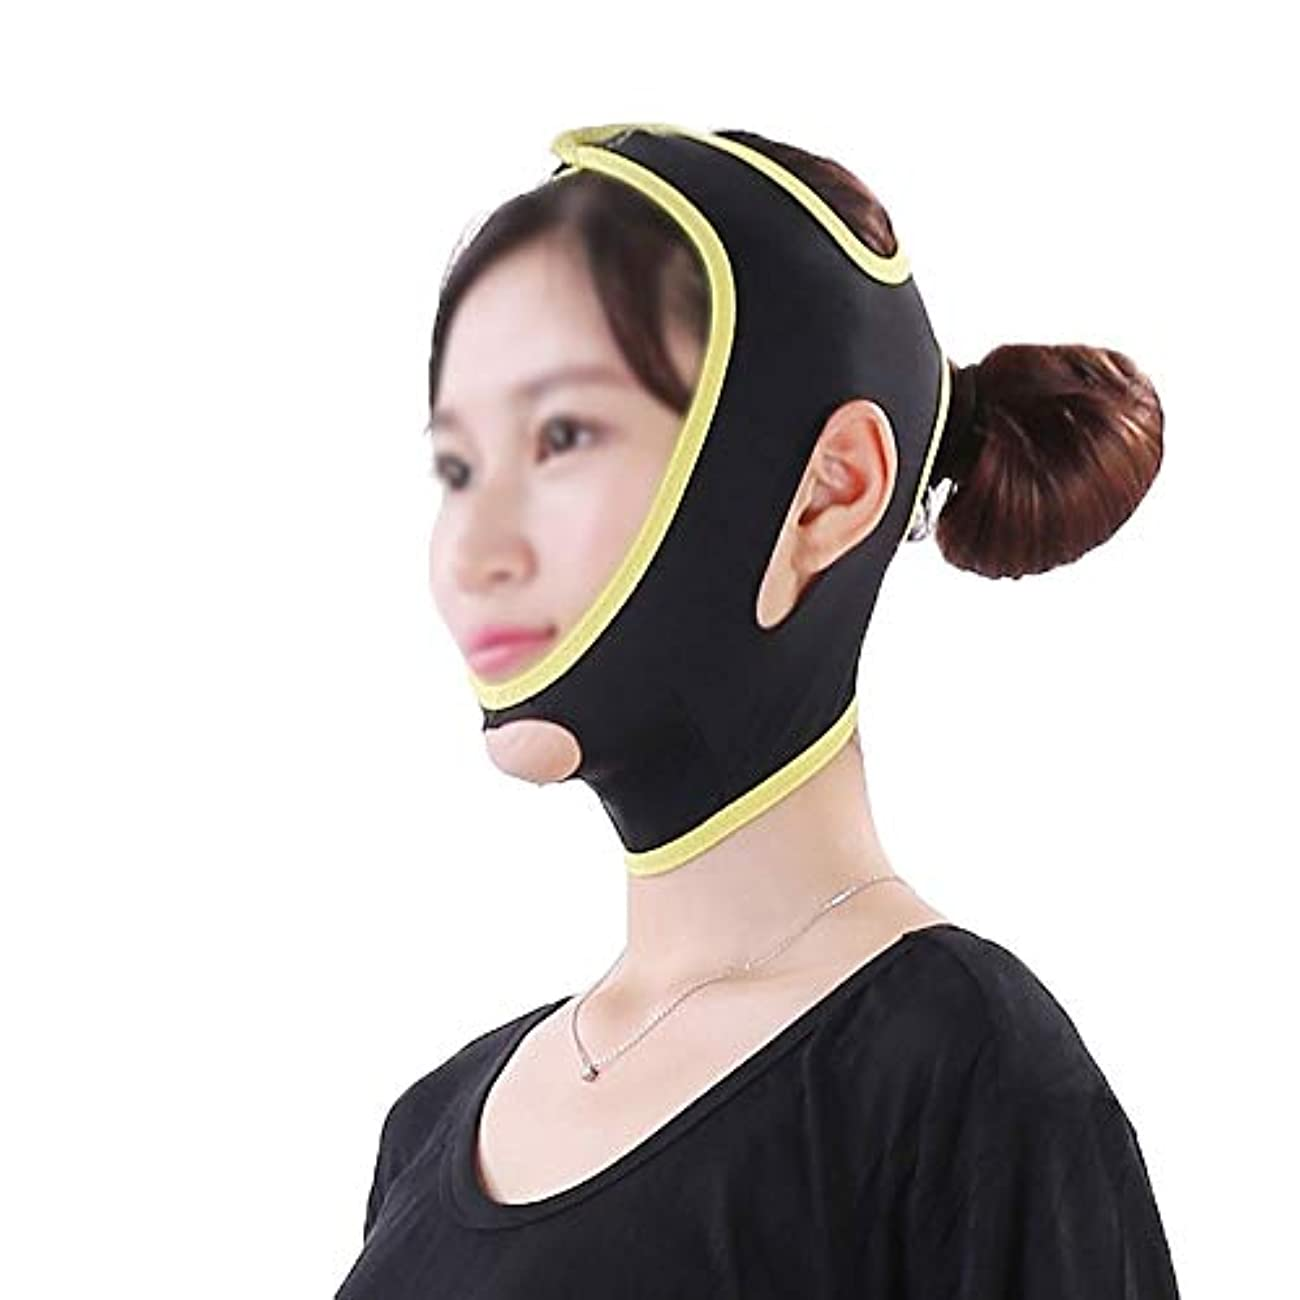 TLMY フェイス&ネックリフトシンフェイスマスクパワフルマスクフェイスリフトアーチファクトフェイスリフトフェイスツールシンフェイス包帯シンフェイスマスク美容マスク 顔用整形マスク (Size : L)